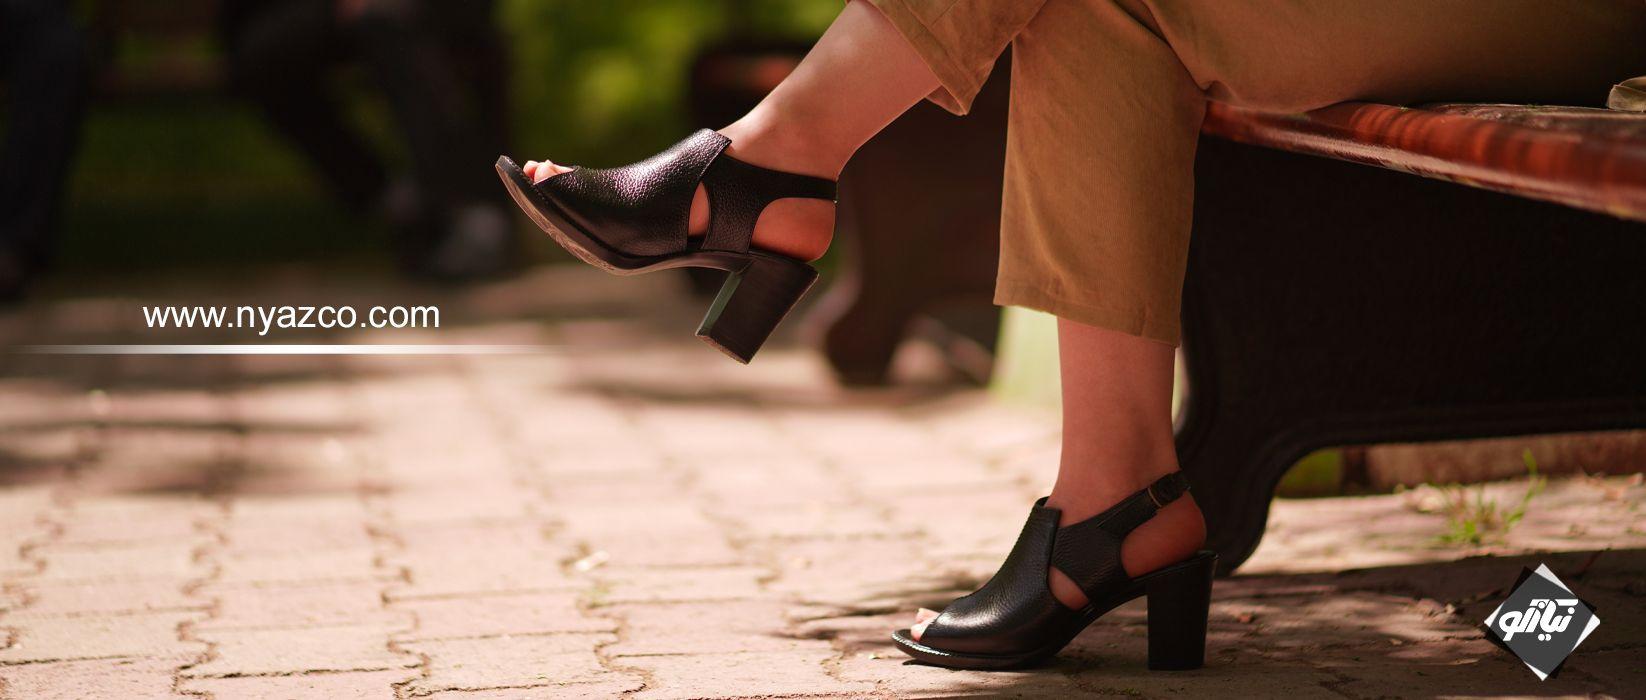 خرید کفش پاشنه دار چرم تبریز